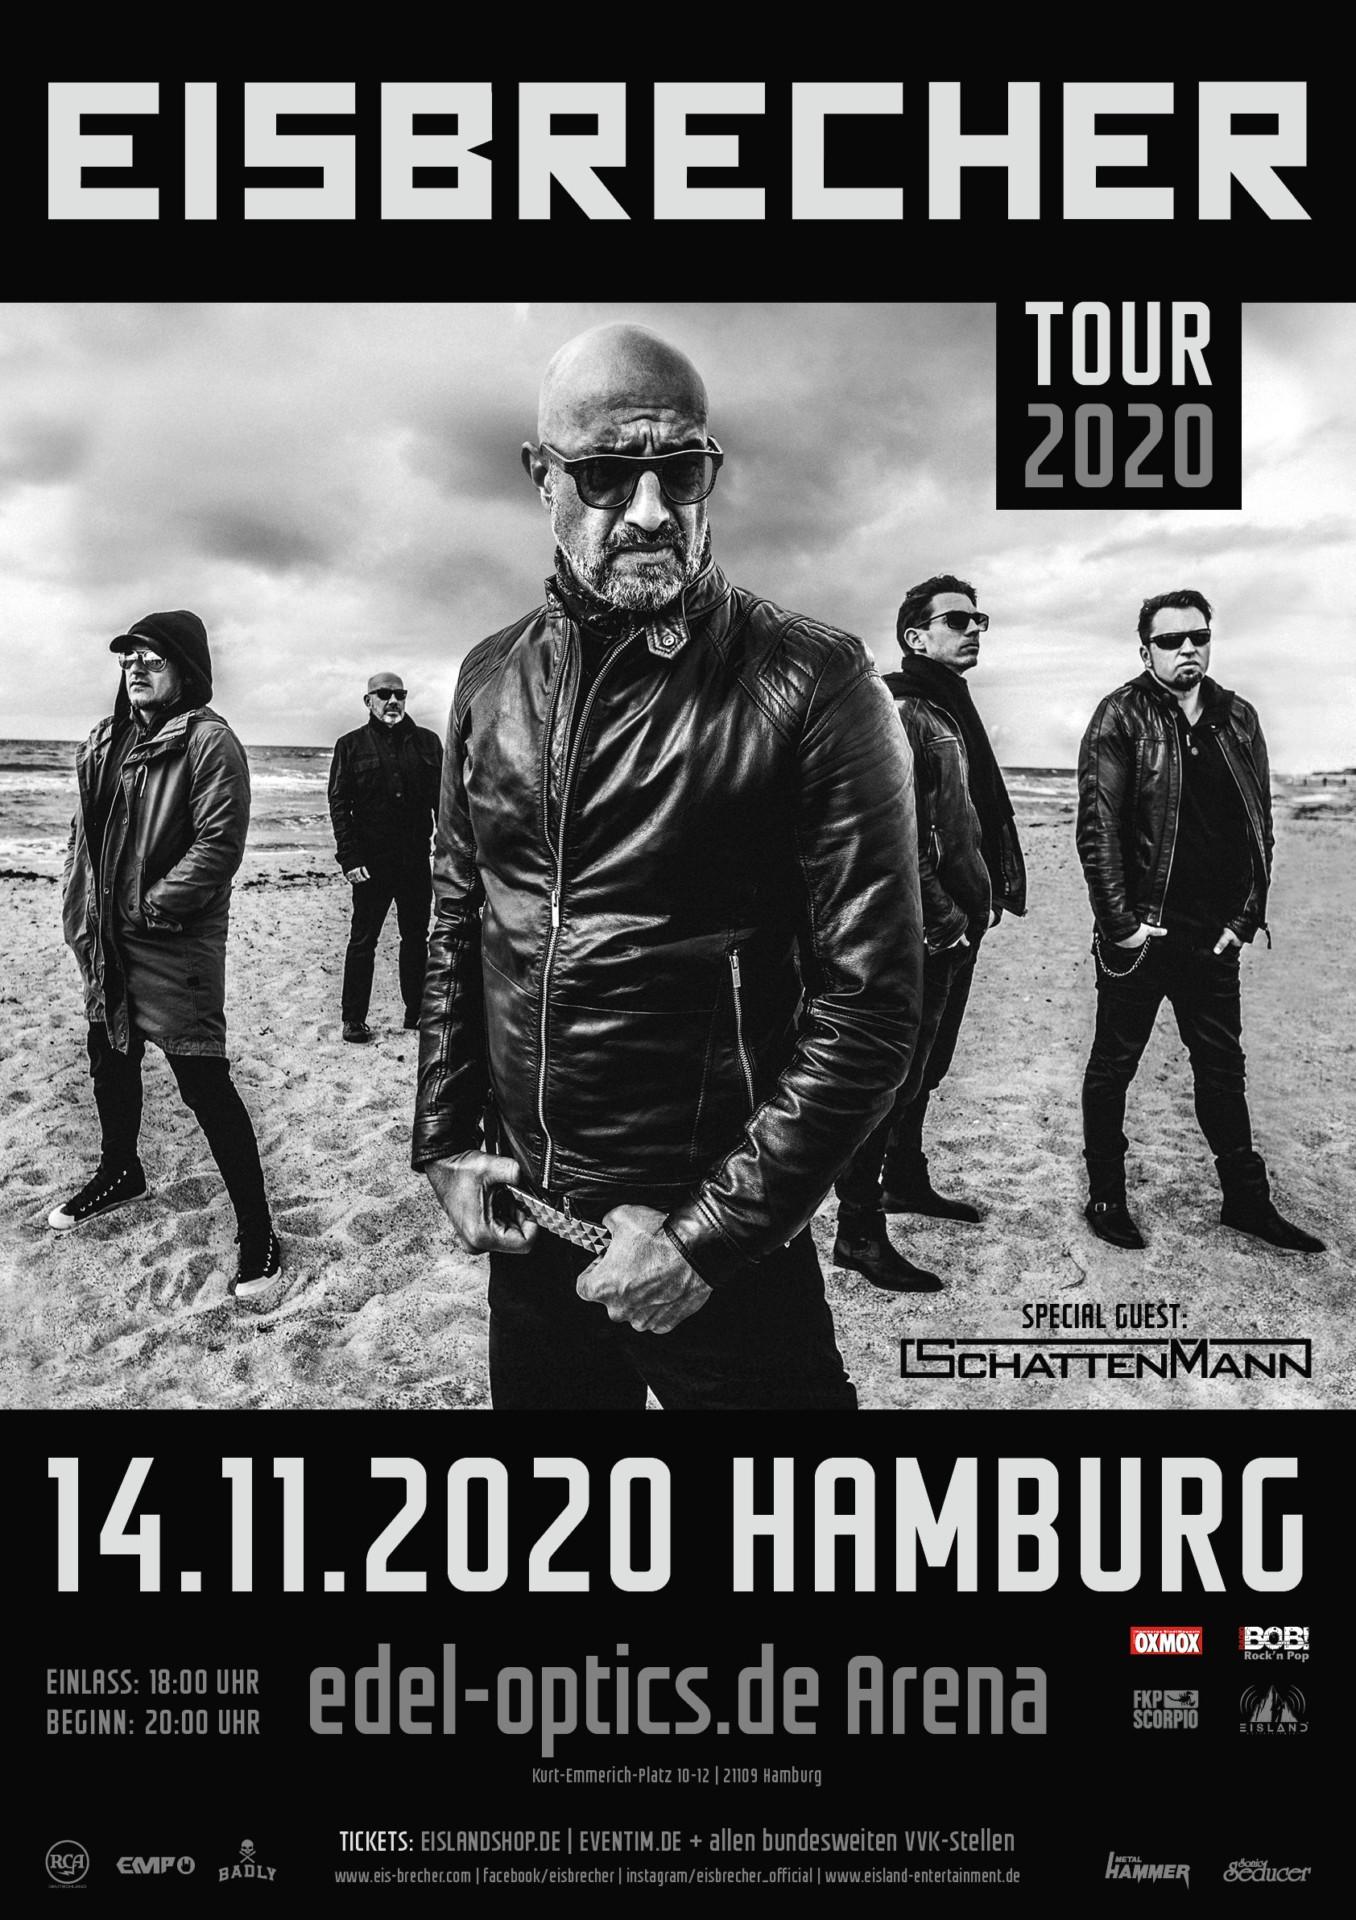 EB Tour2020 Plakat Hamburg neu - OXMOX PRÄSENTIERT DIE TOP TIPPS